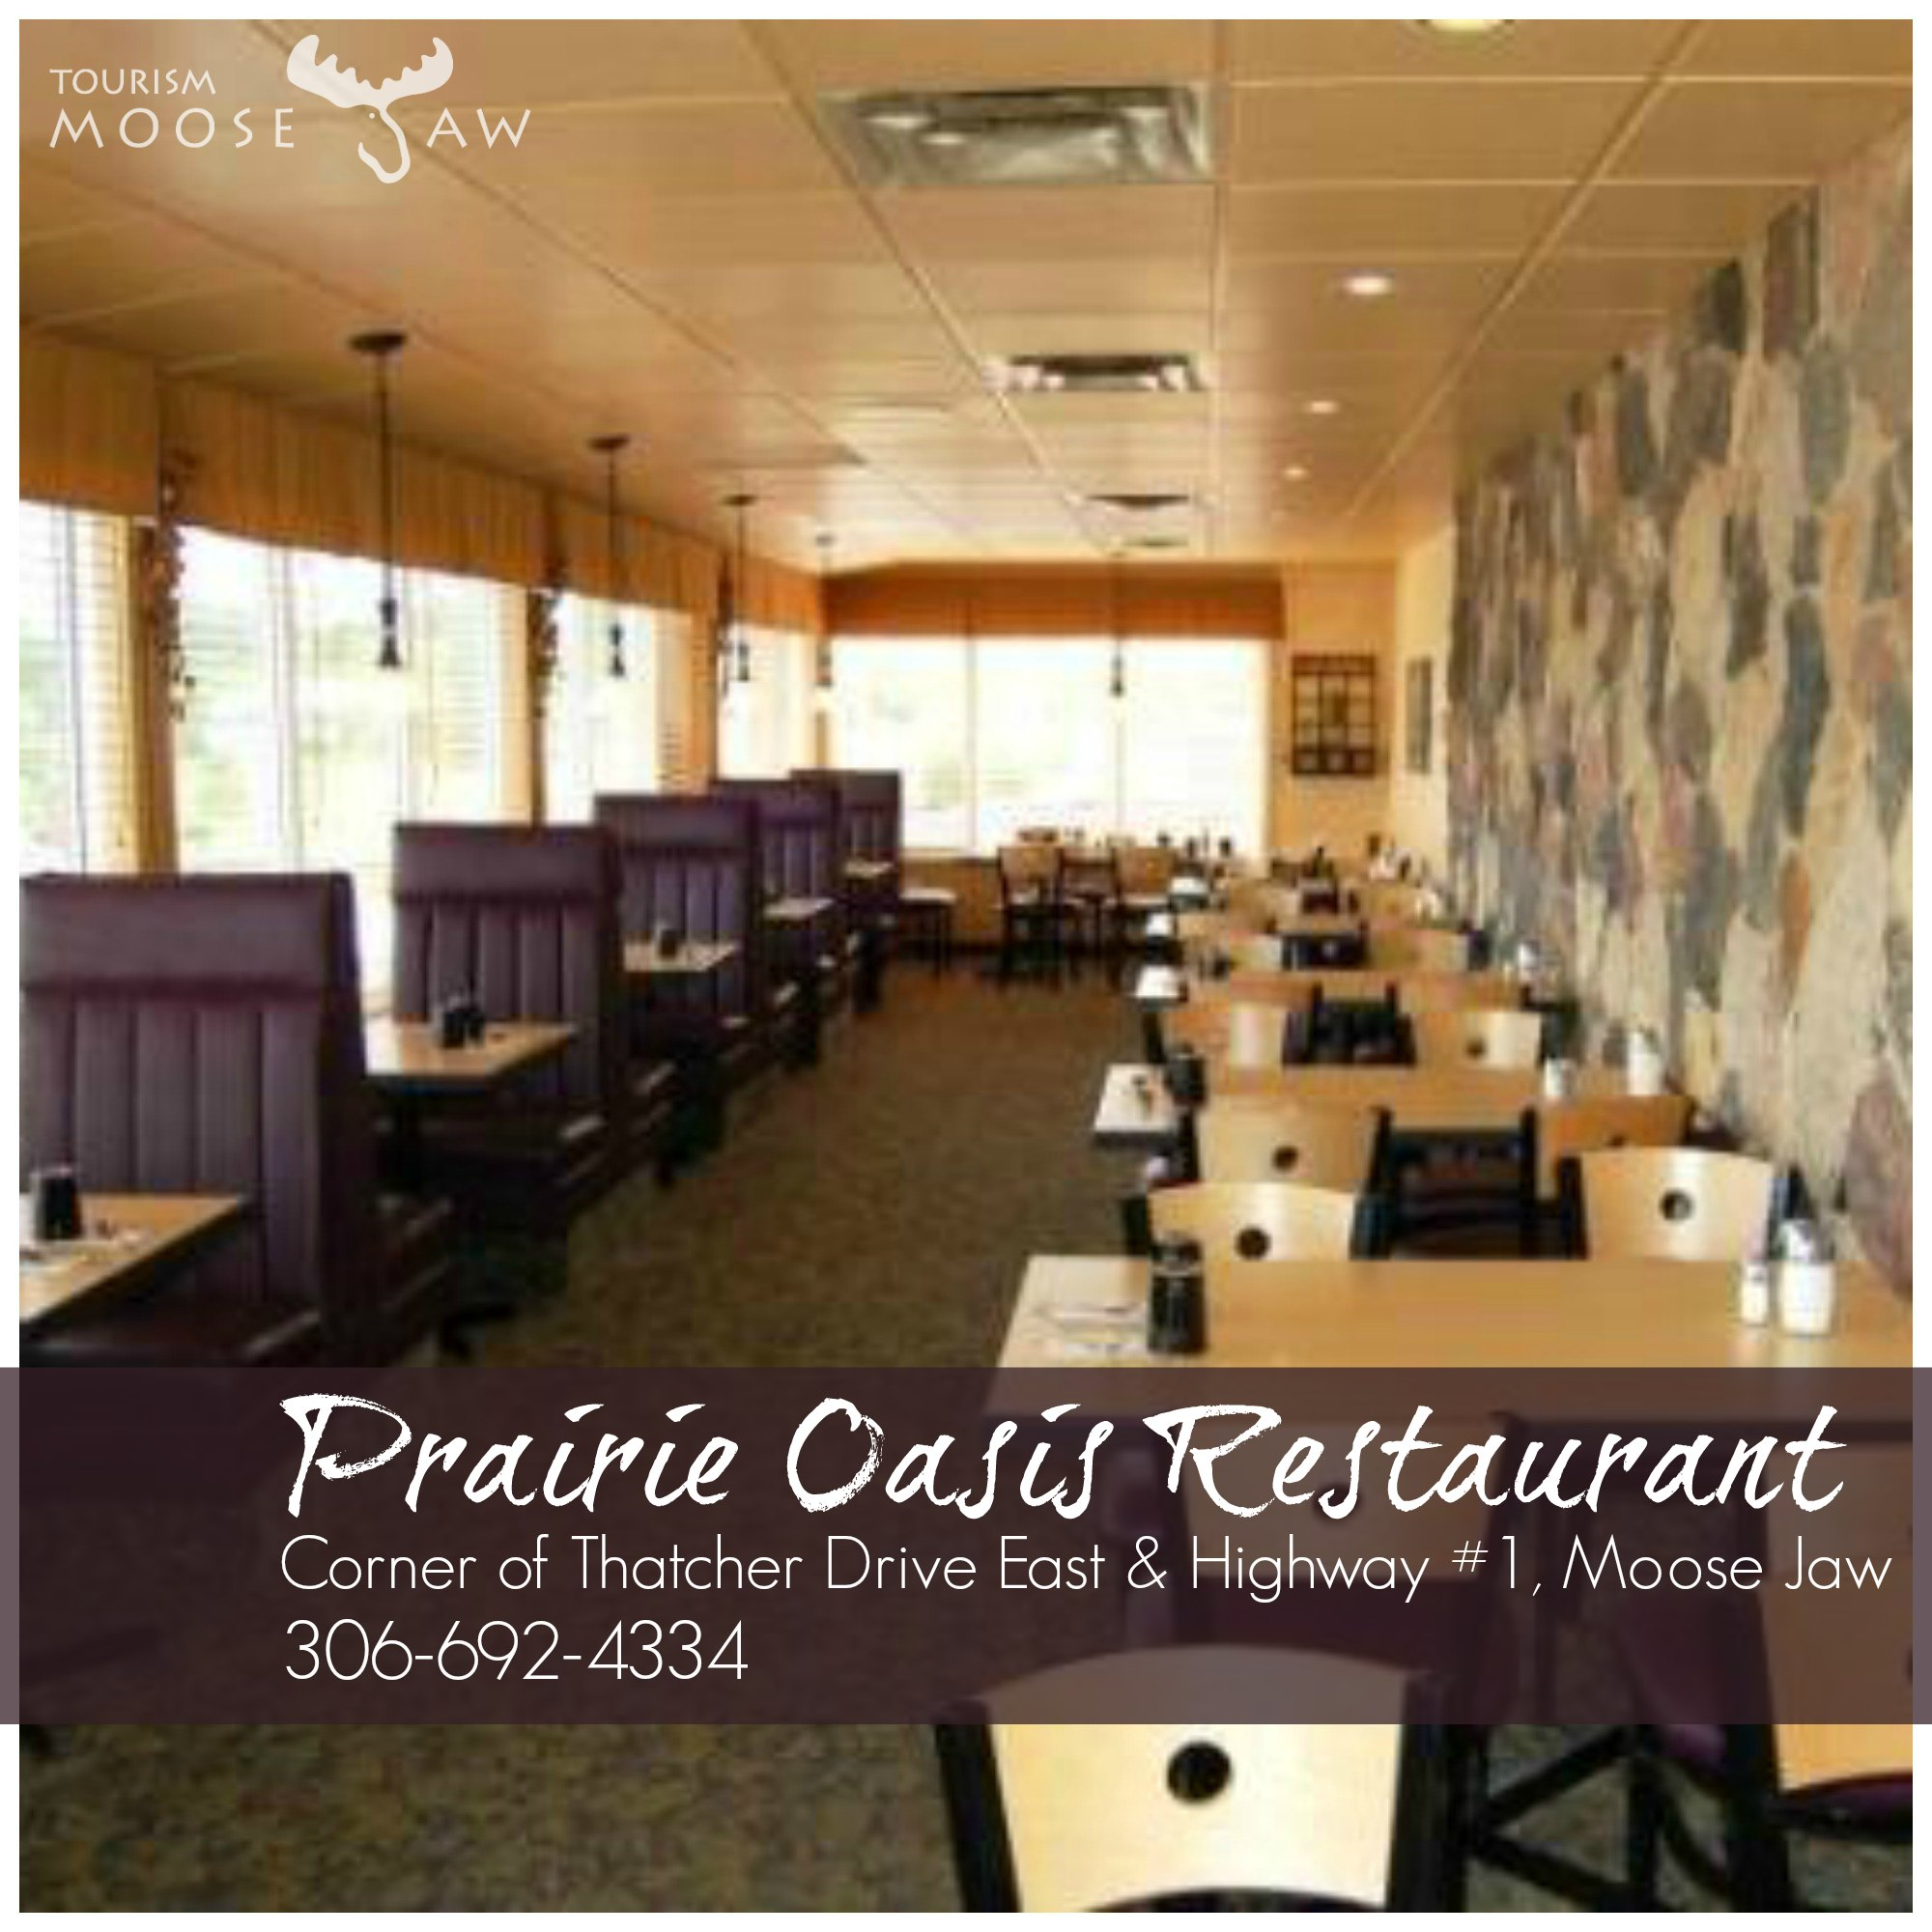 Praire Oasis Restaurant.jpg